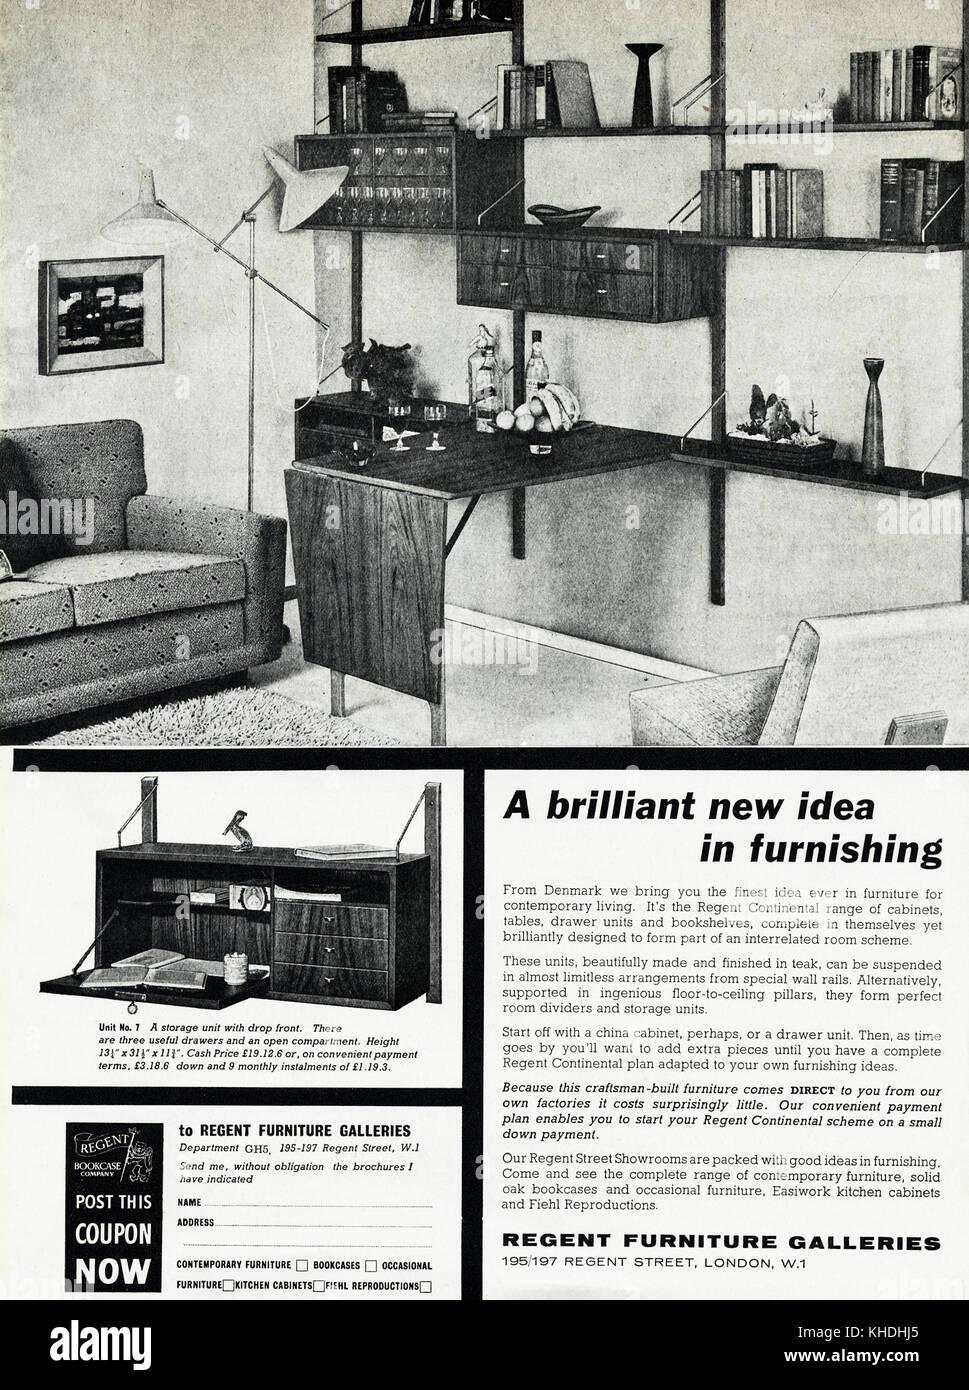 1950s old vintage original advert british magazine print advertisement advertising home furnishing by regent furniture galleries of london england uk dated - Home Furnishing Magazine